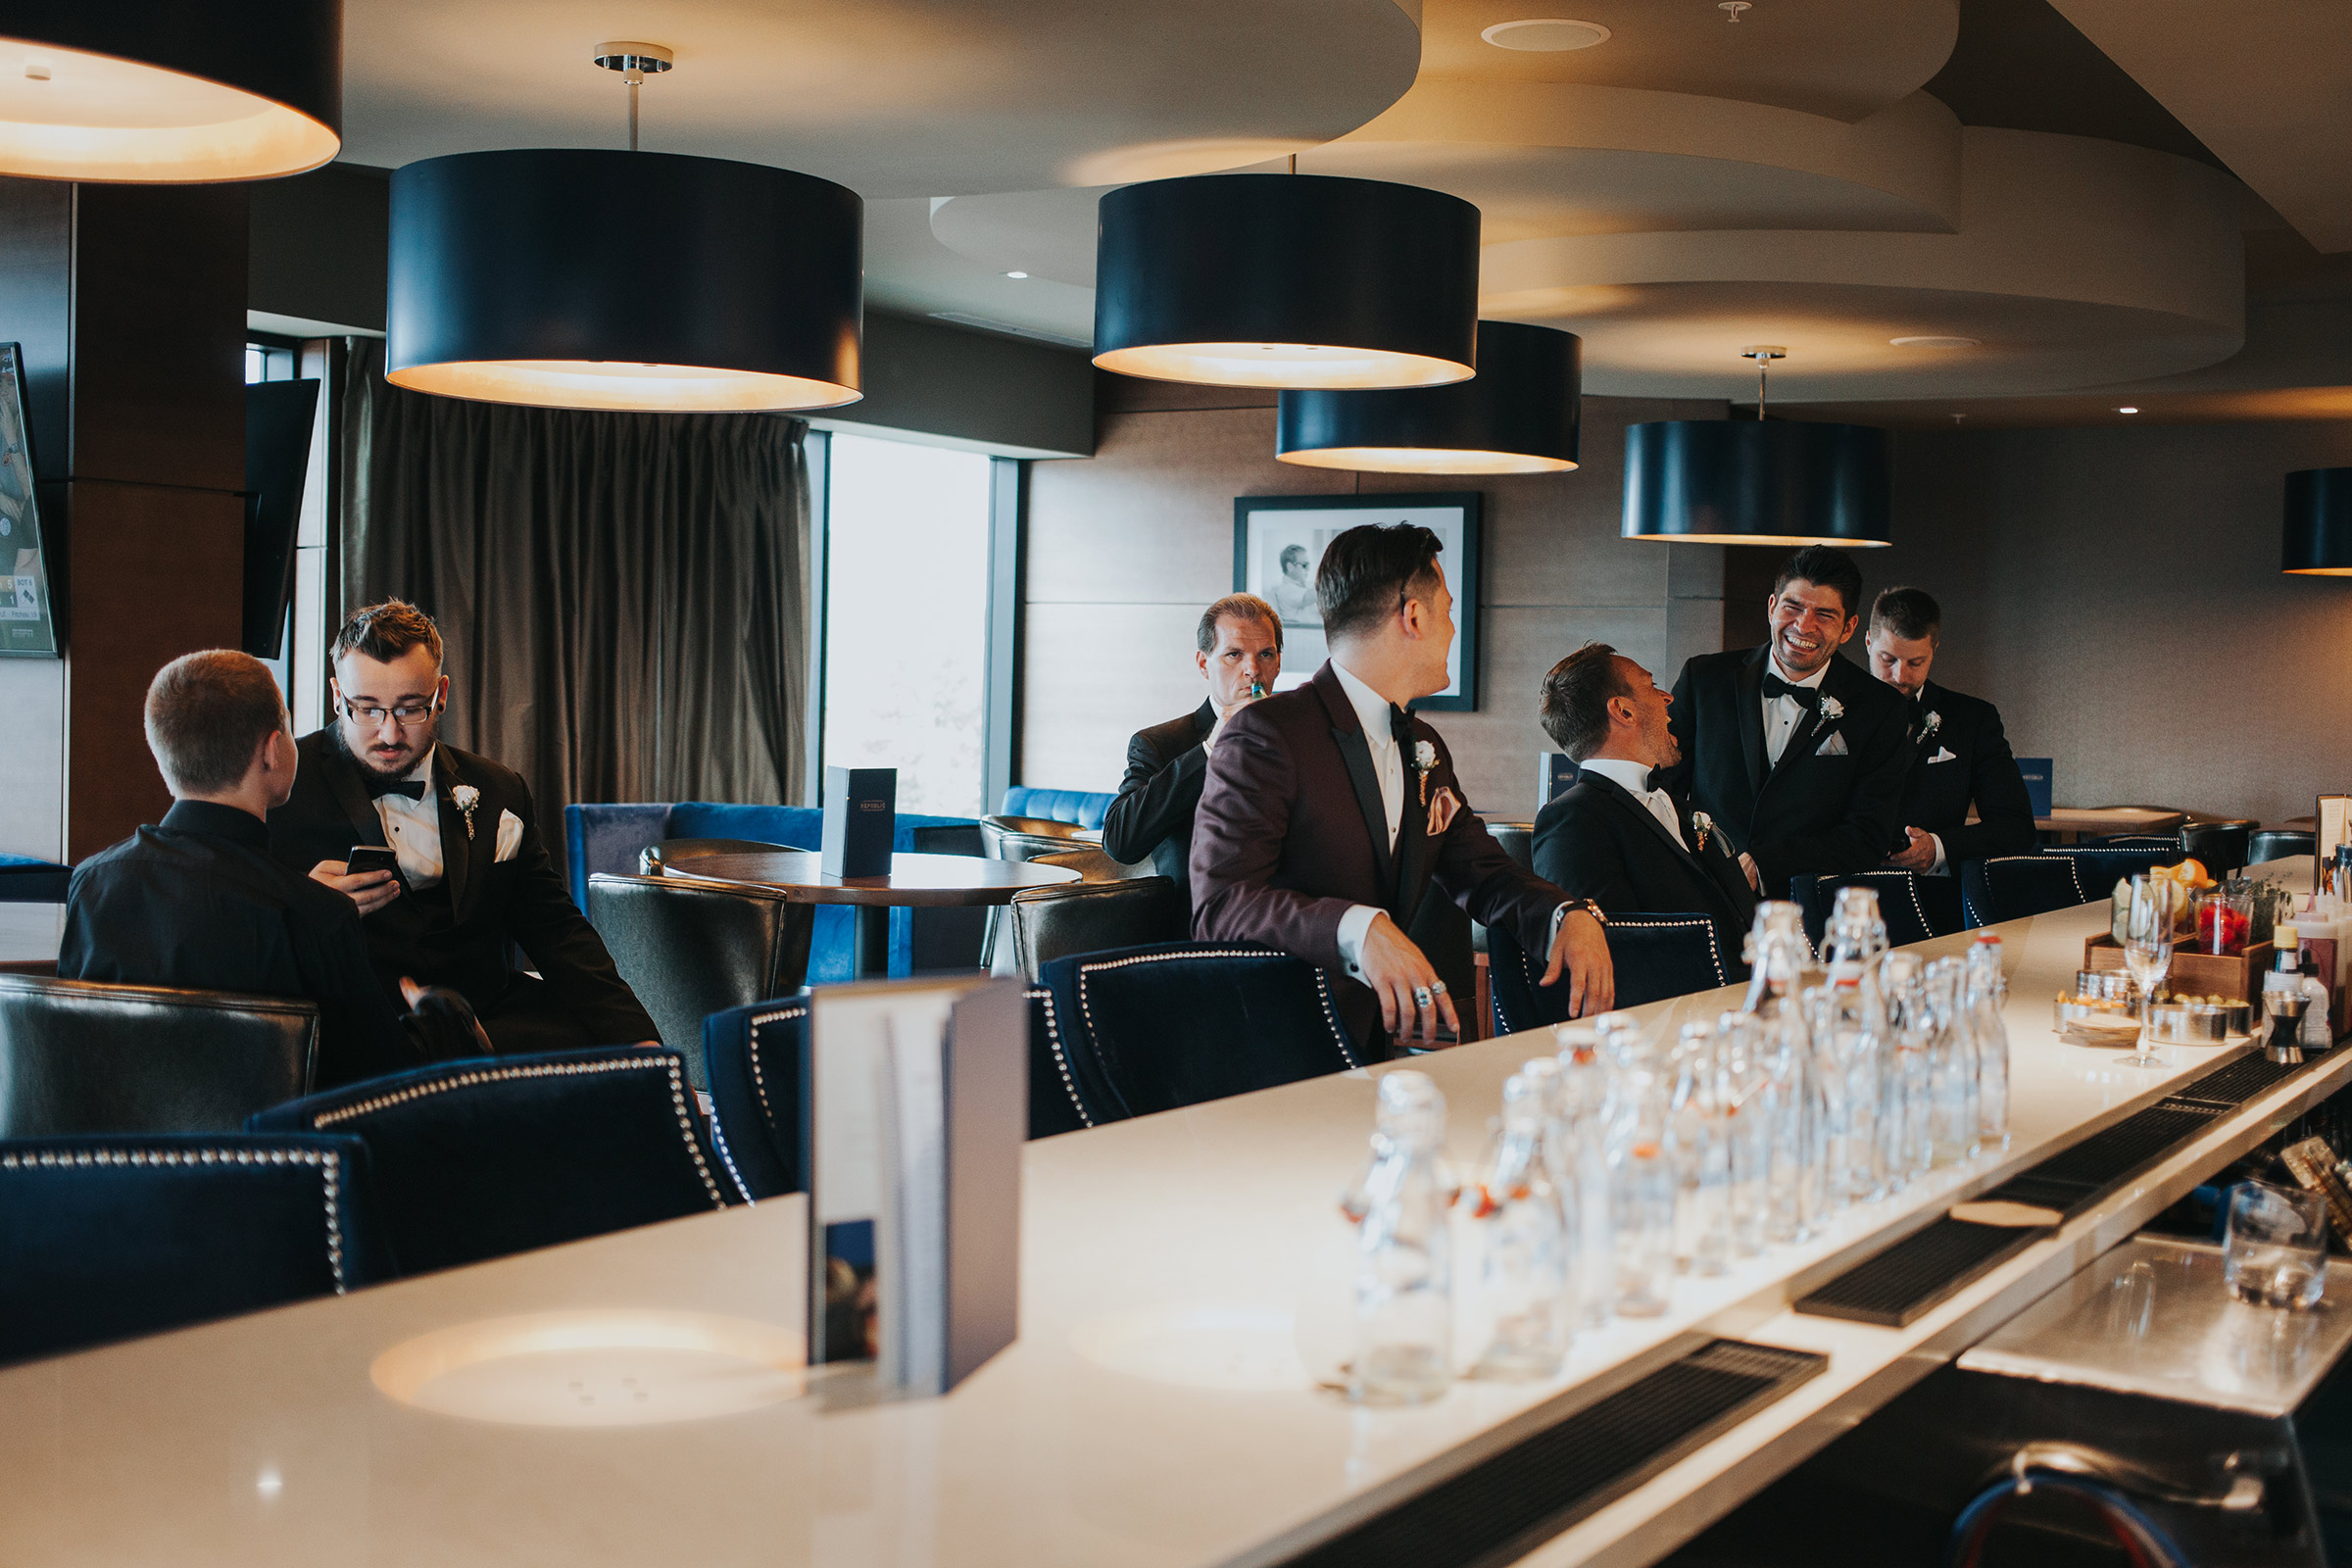 groomsmen-ordering-drinks-republic-on-grand-desmoines-iowa-ac-hotel-raelyn-ramey-photography.jpg